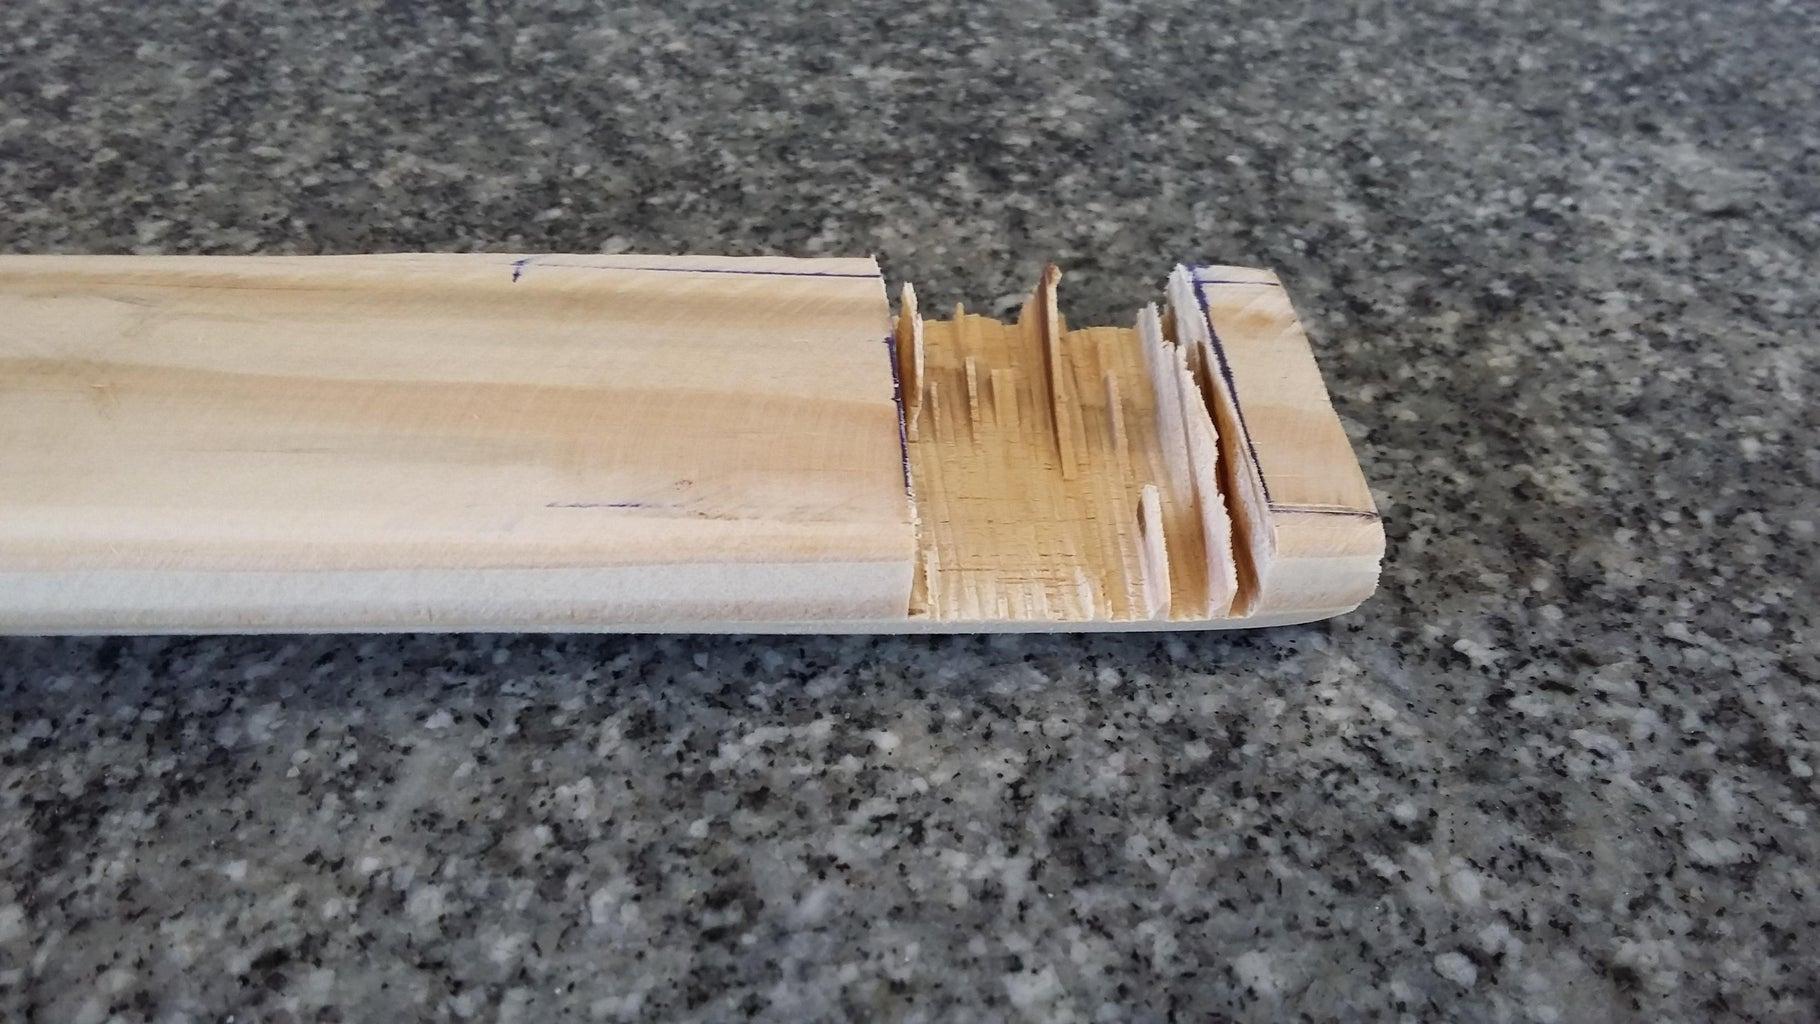 Preparing the Wood for Tuning Screws